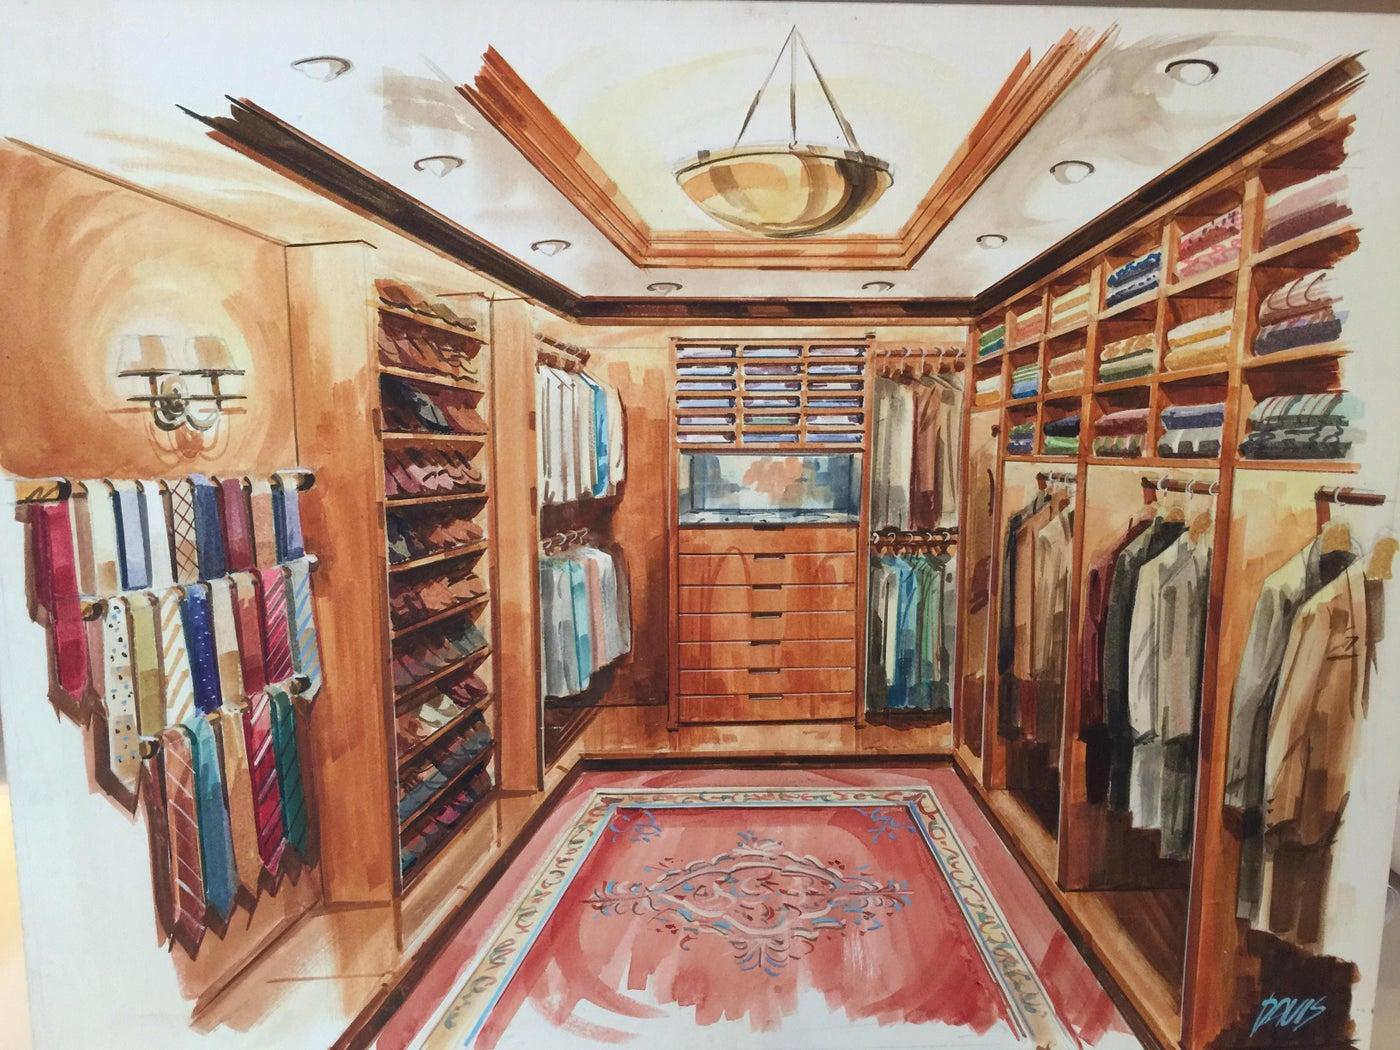 Each custom-sized closet has shoe racks, shelving, even a place for men's ties.